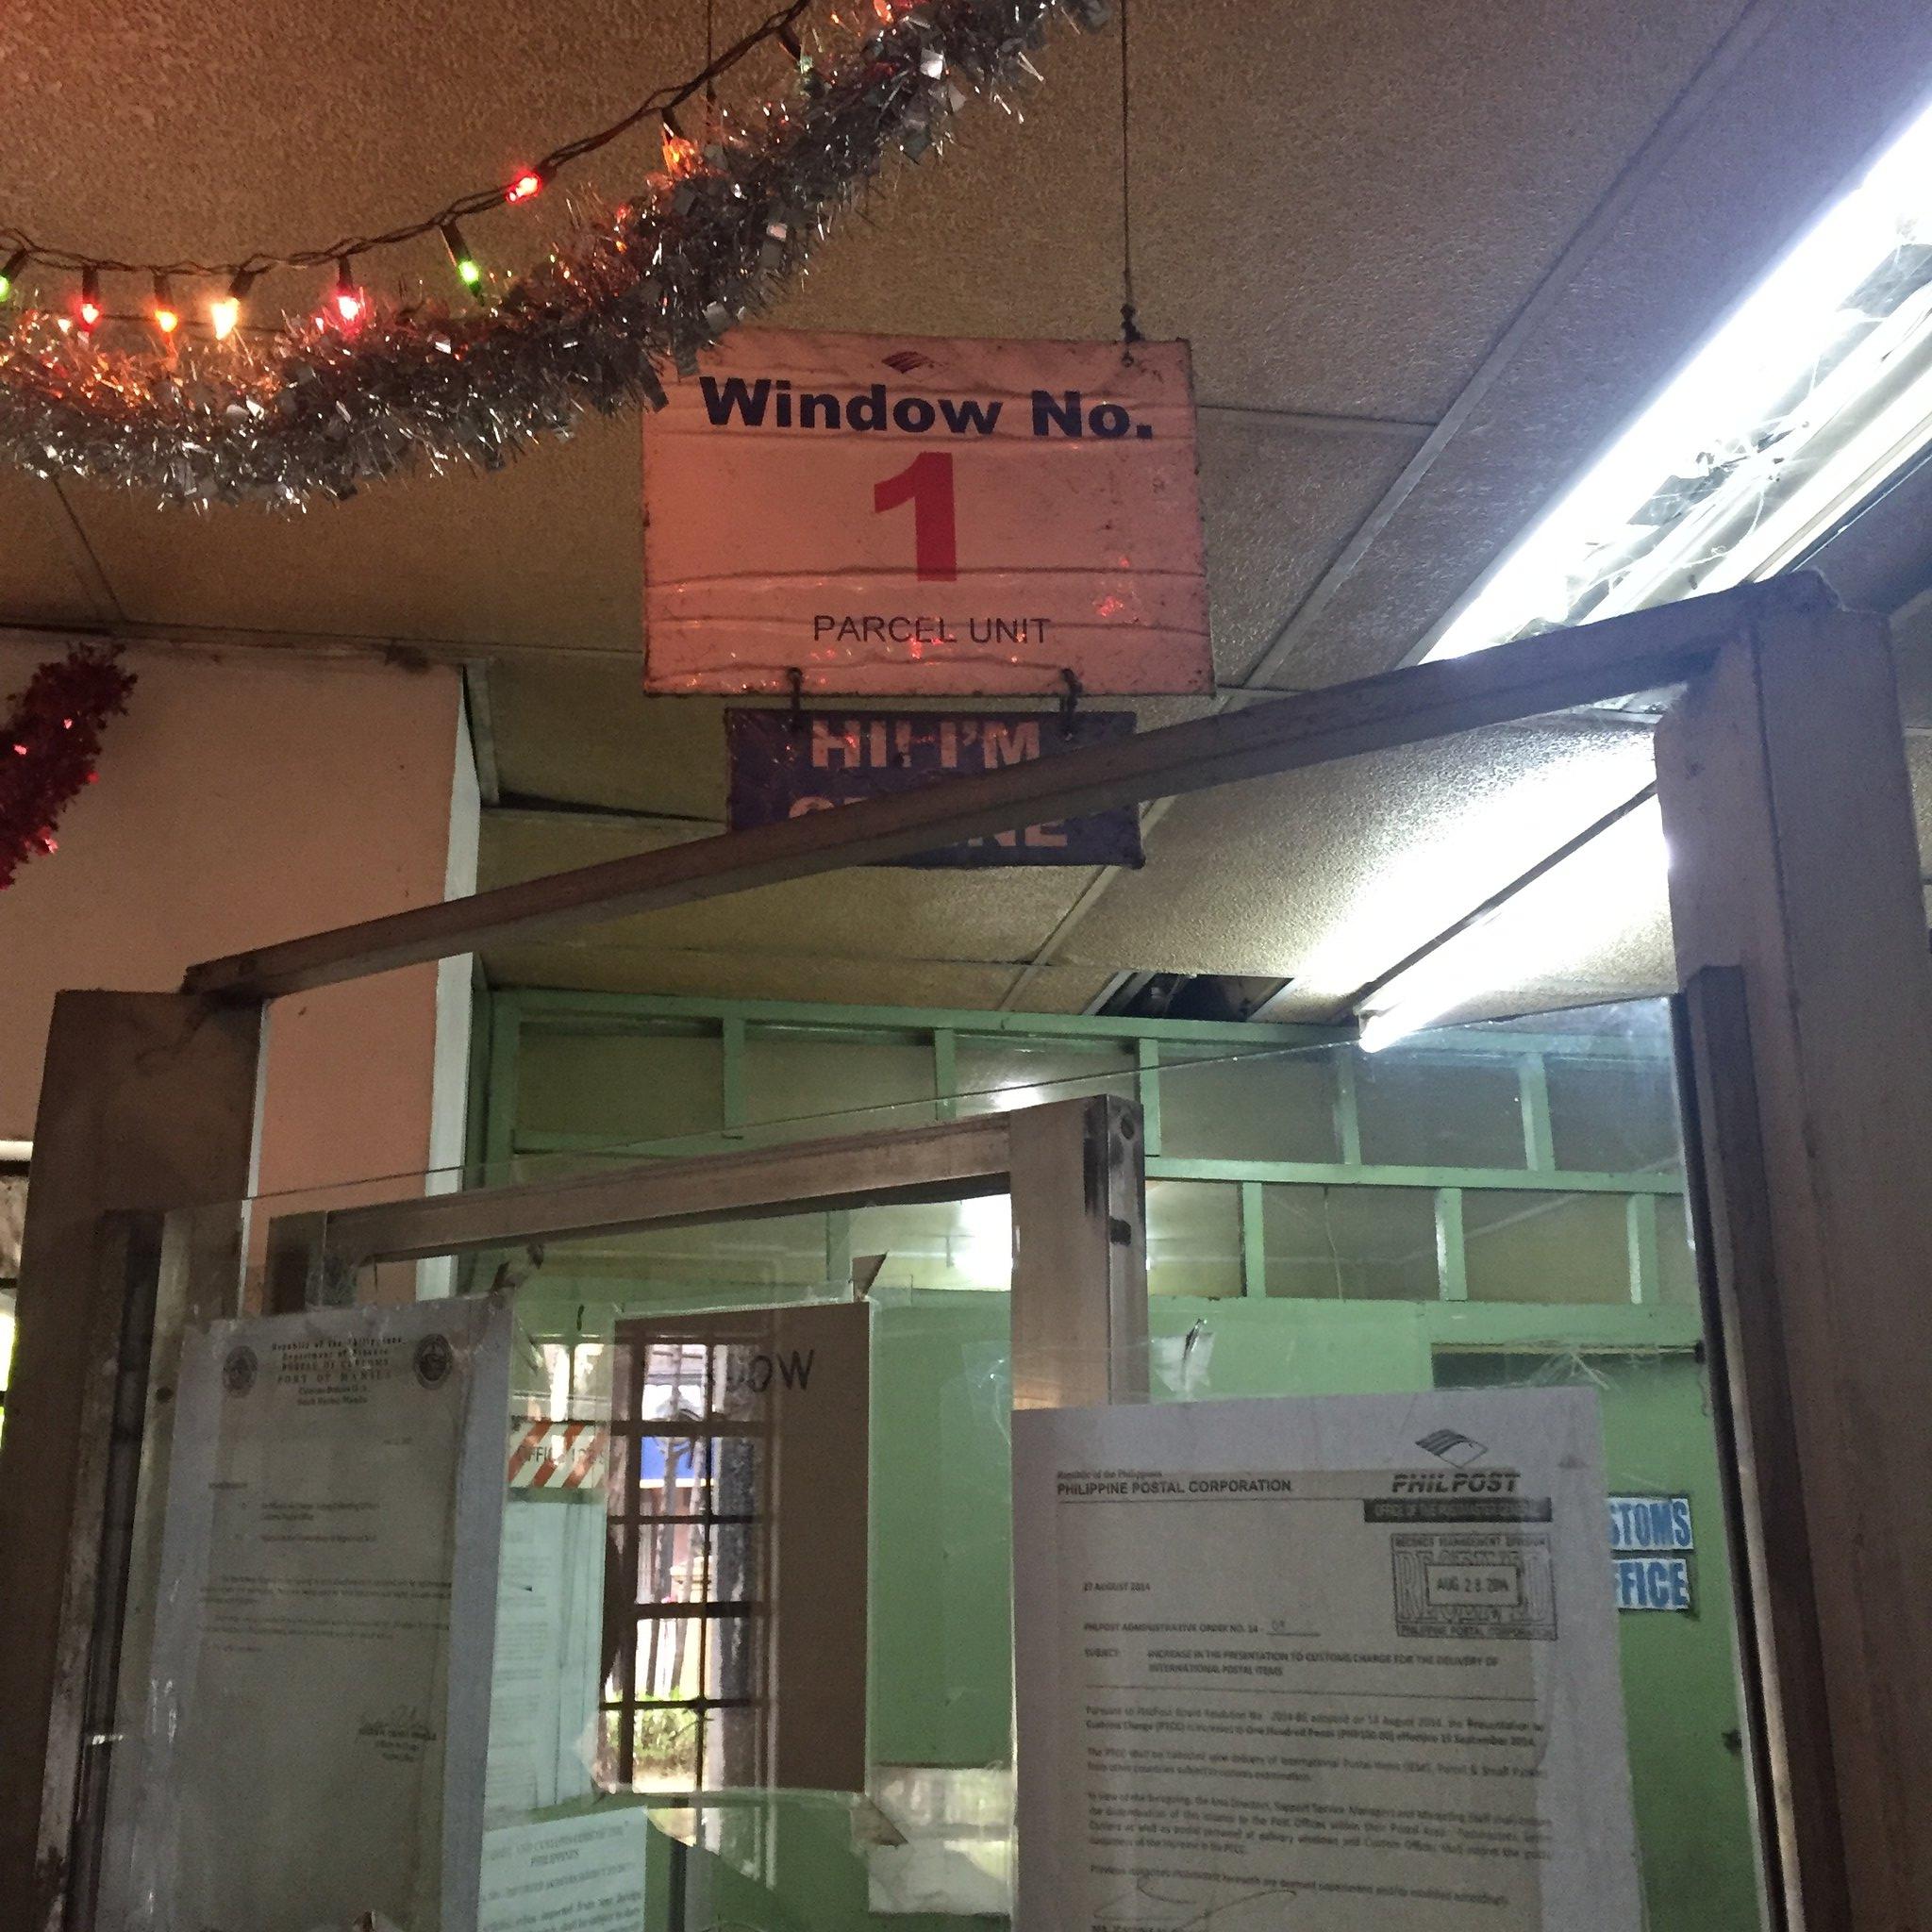 PhilPost Mandaluyong window 1